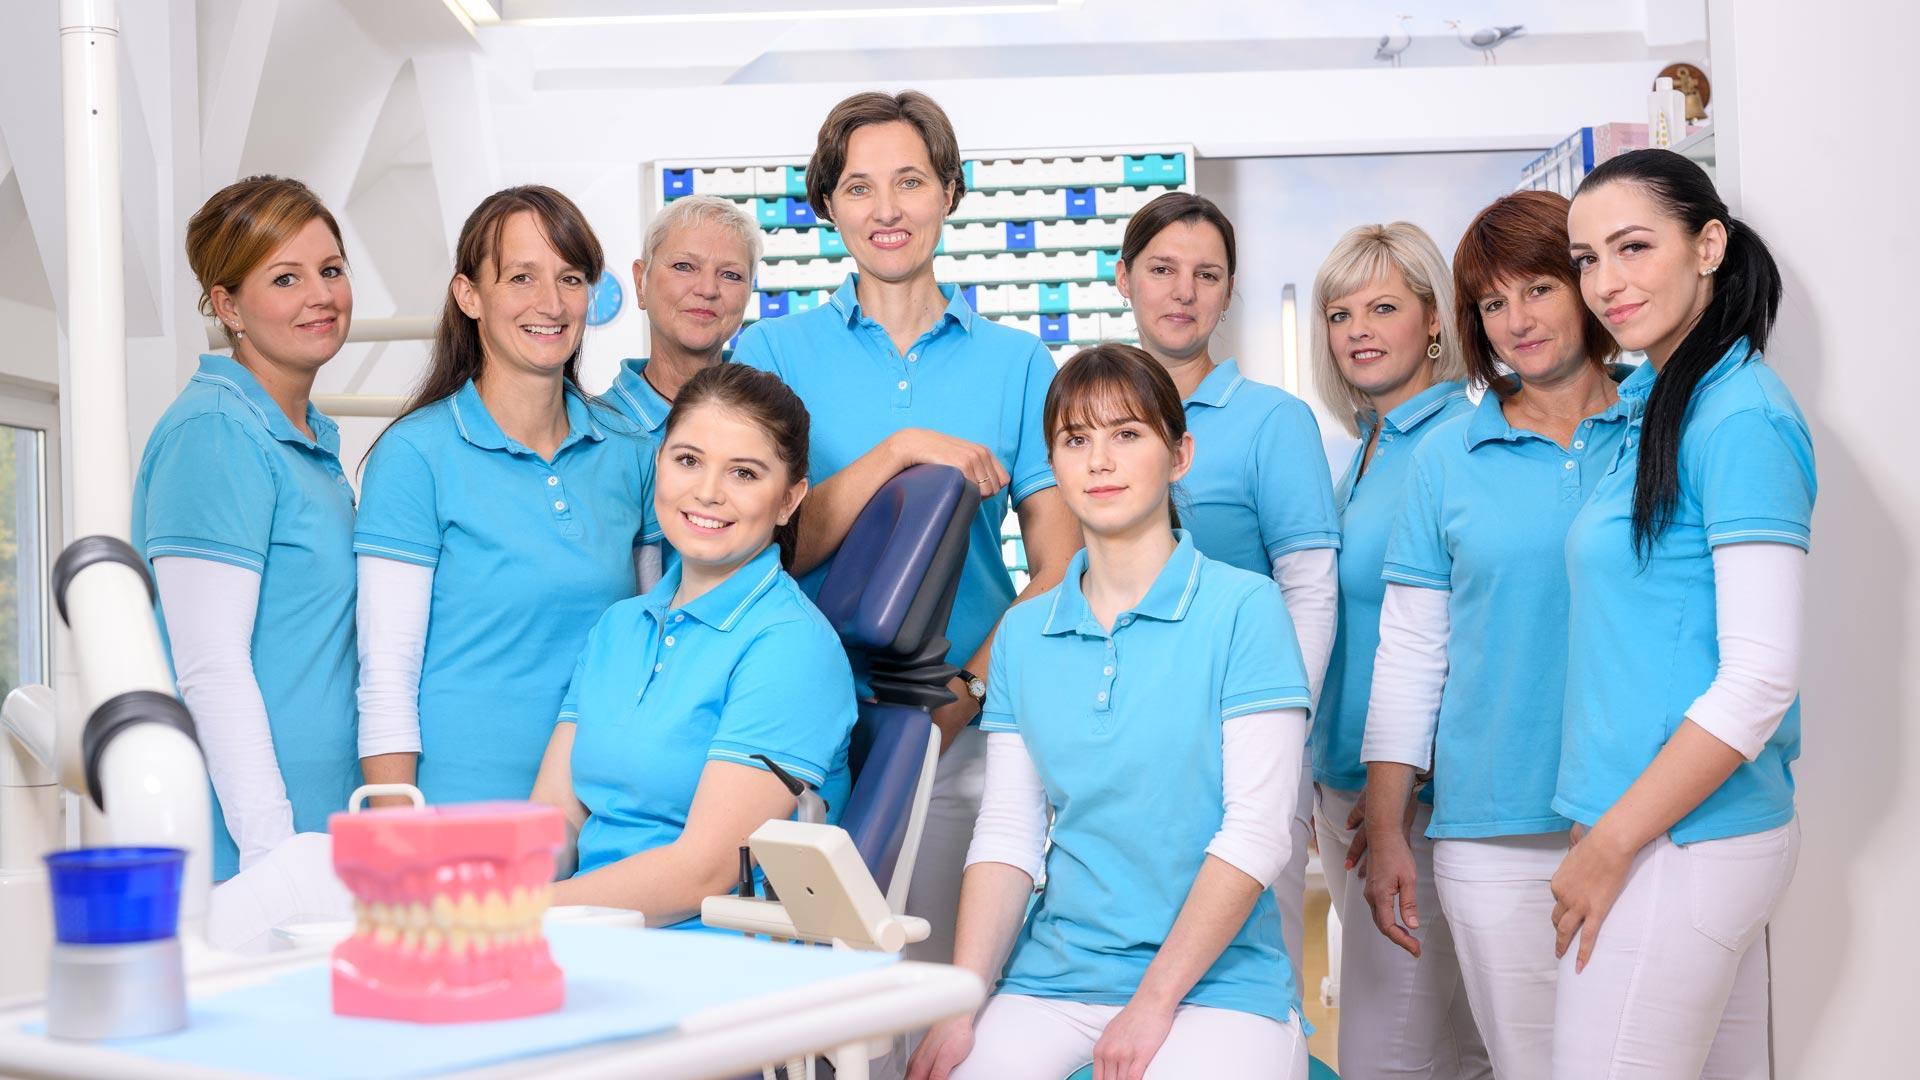 KFO-Karlshorst (Frau Dr. Kerstin Wiemer) - Team